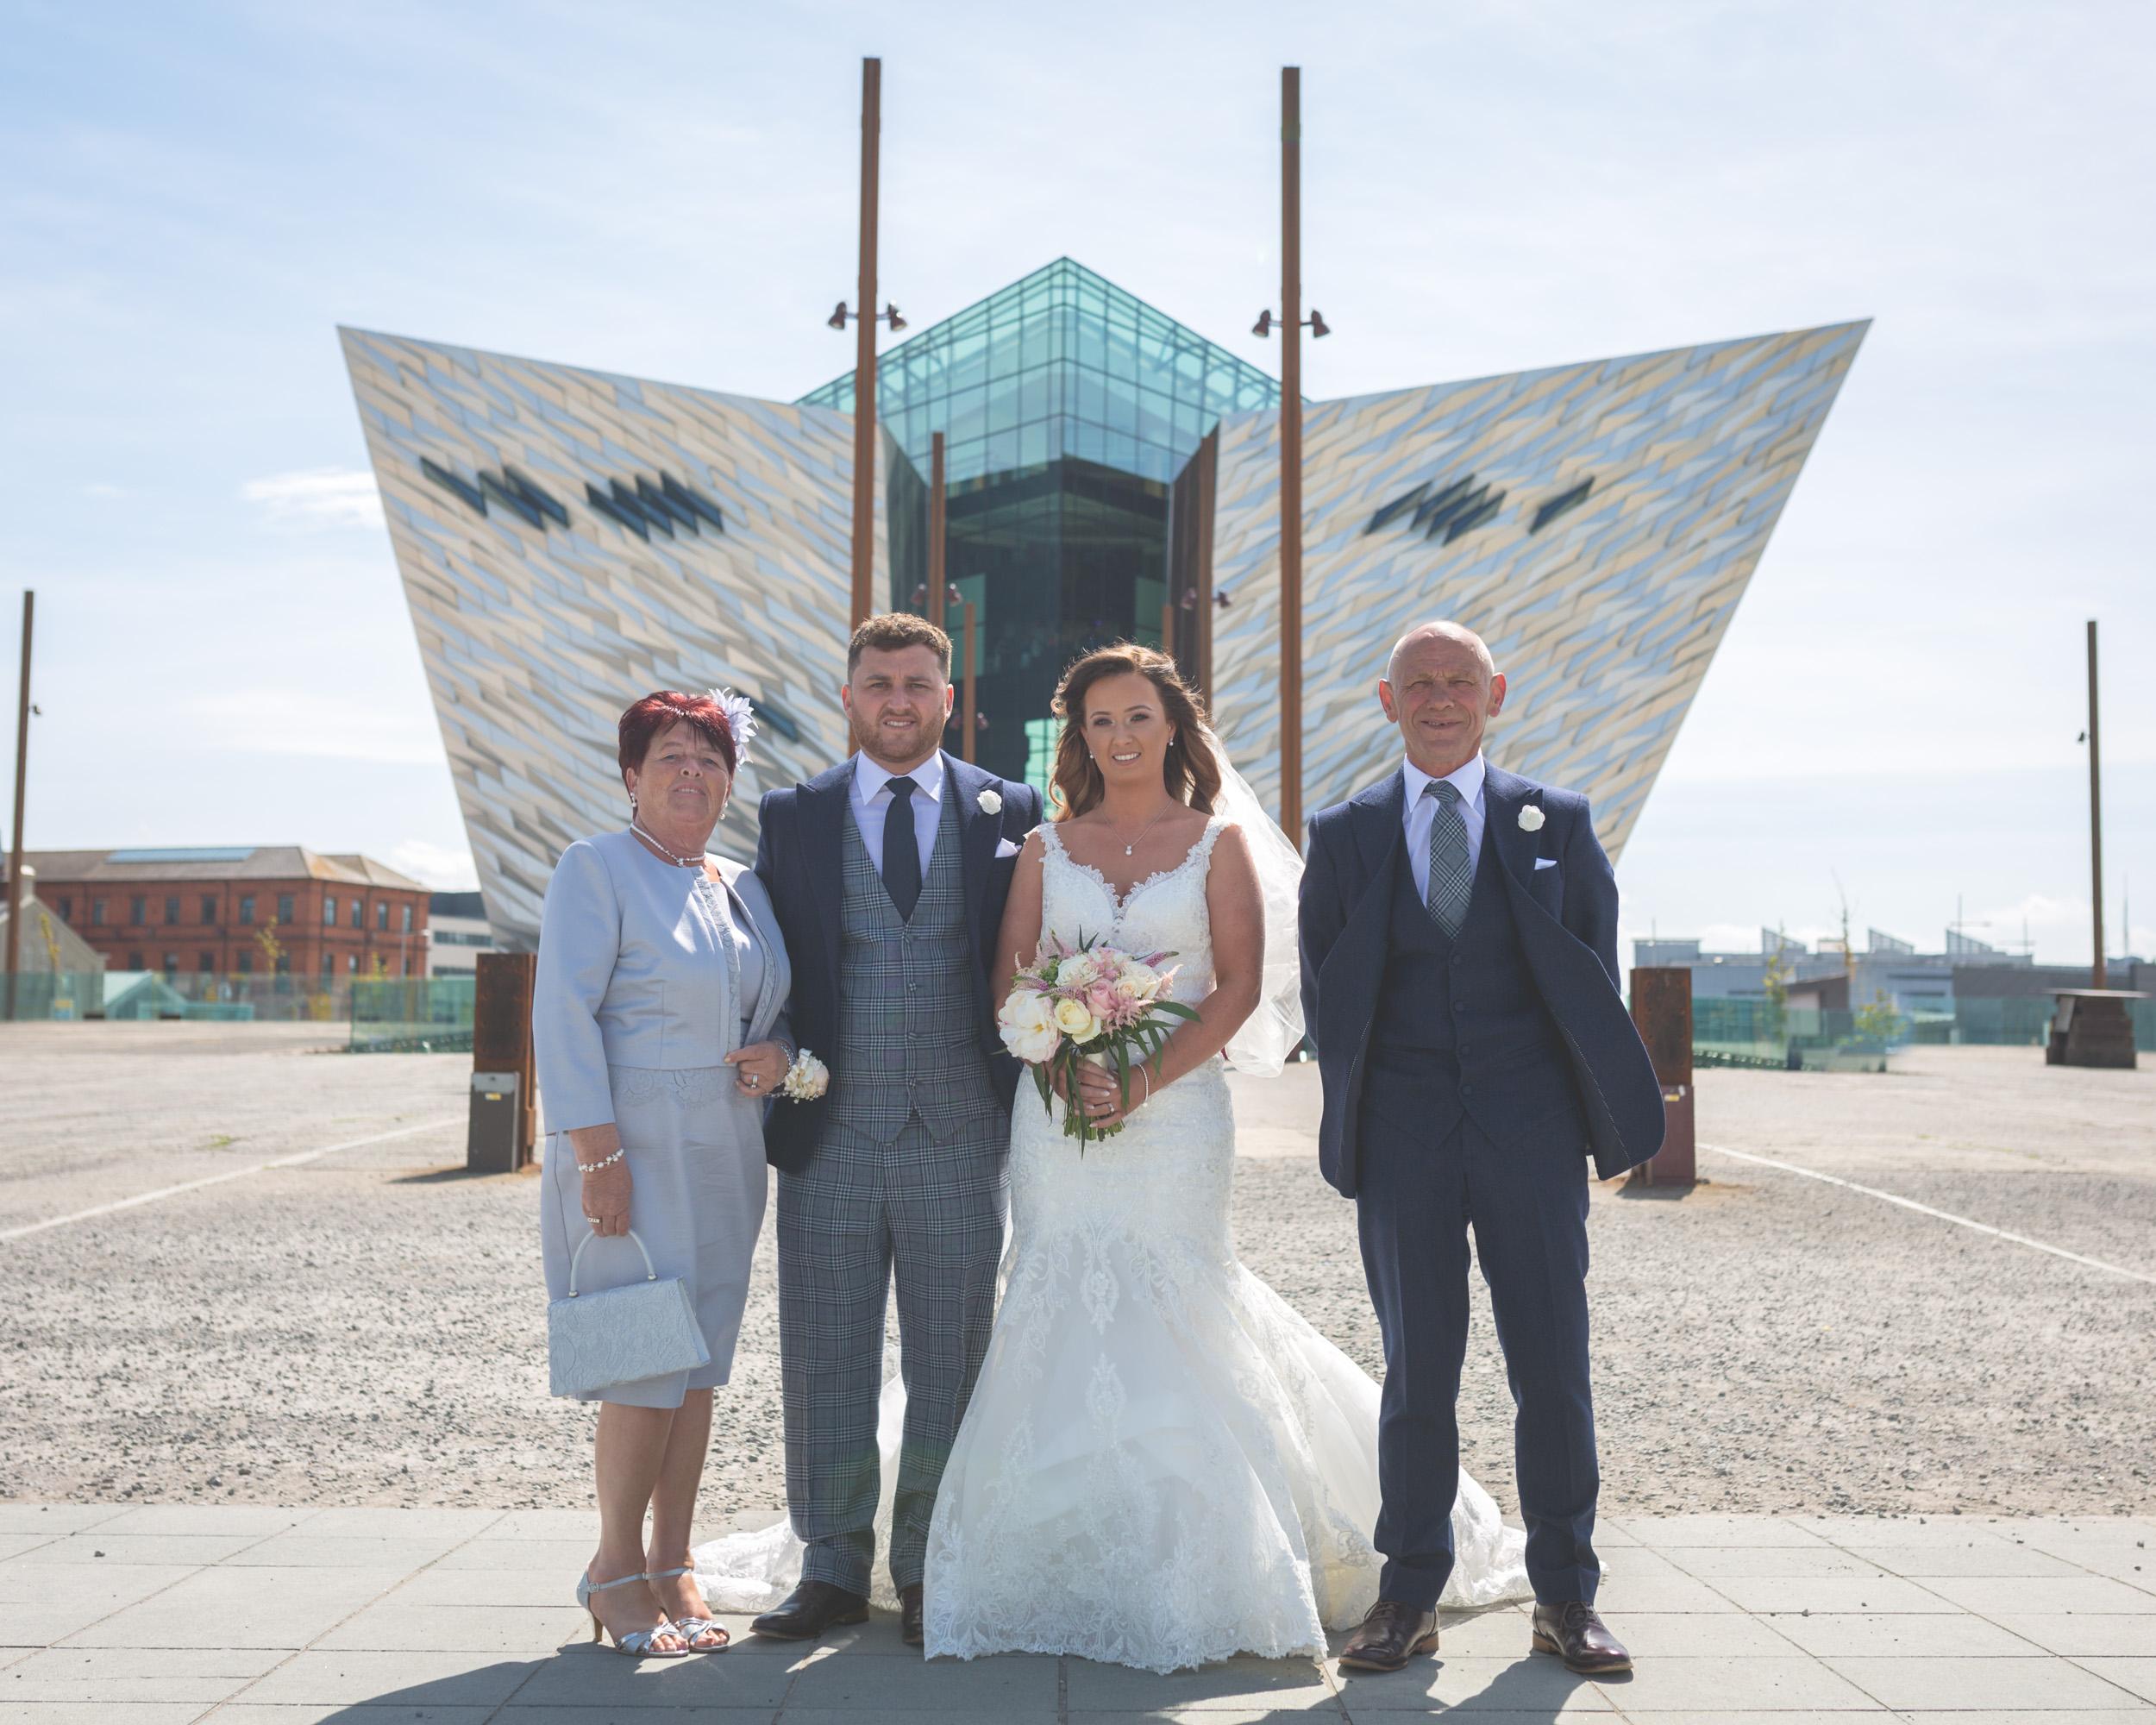 Brian McEwan   Northern Ireland Wedding Photographer   Rebecca & Michael   Portraits-25.jpg